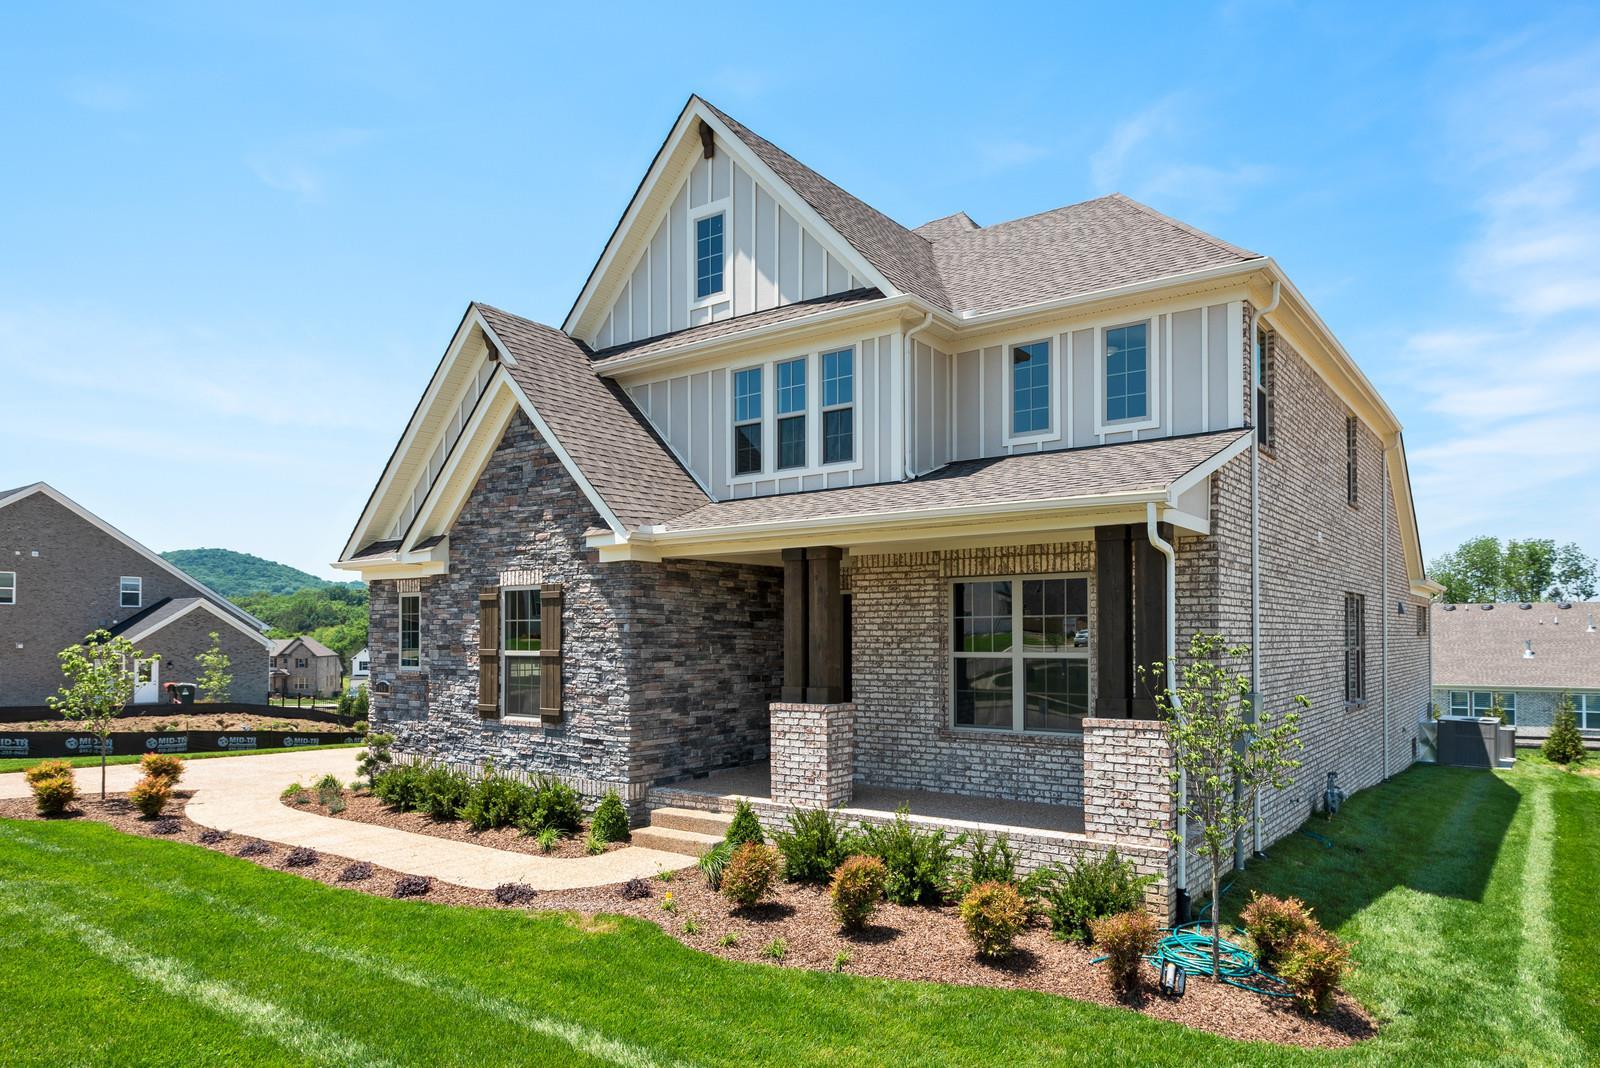 143 Telfair Lane #10, Nolensville, TN 37135 - Nolensville, TN real estate listing